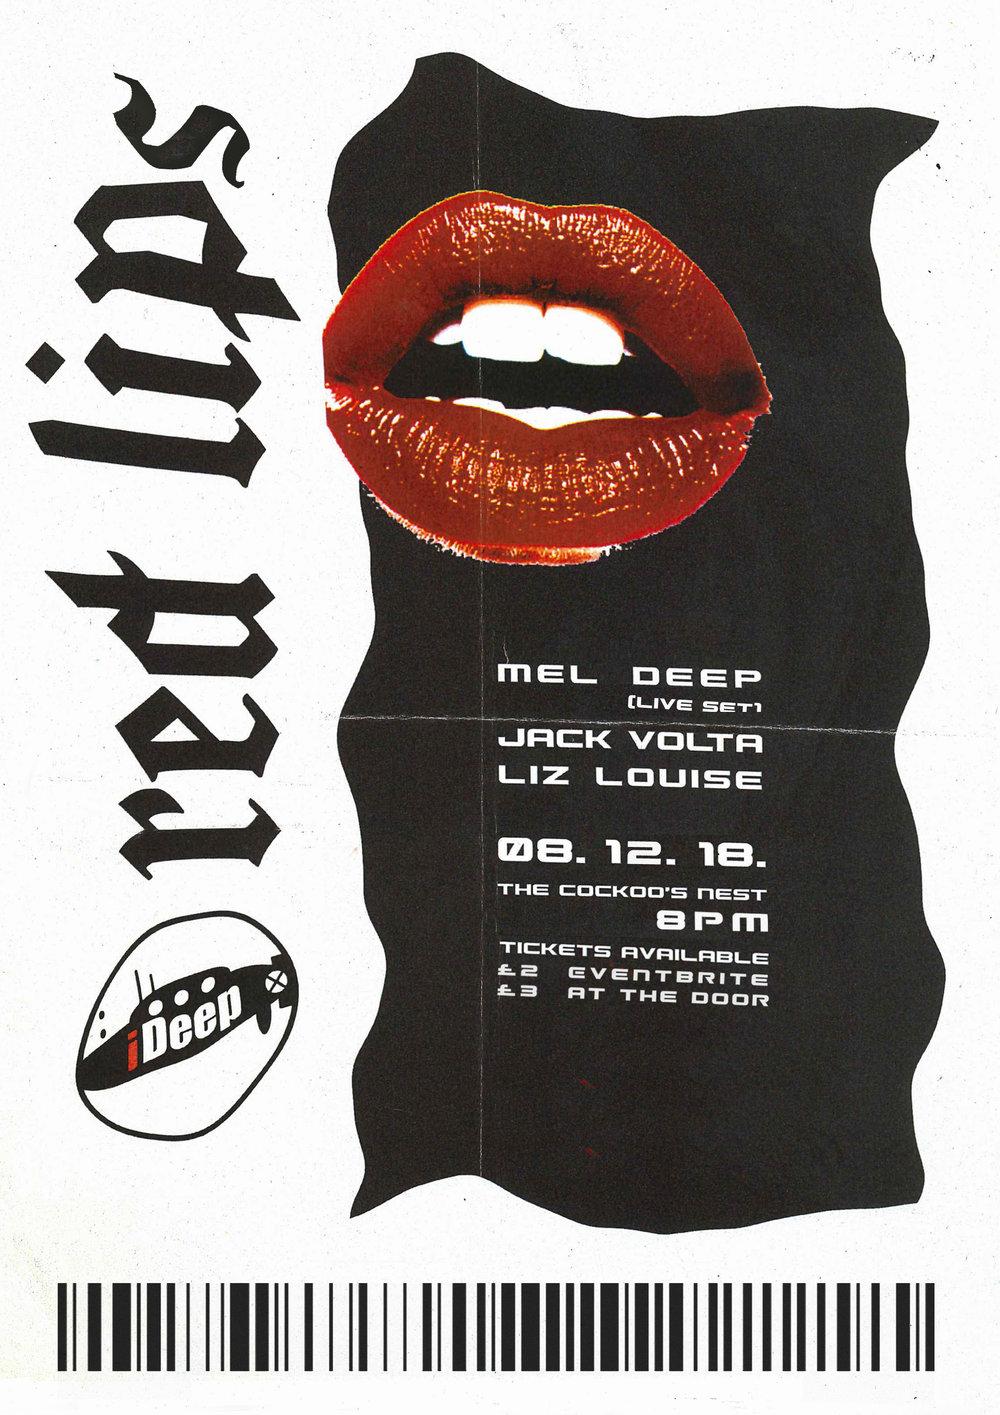 mel_deep_red_lips_live_set.jpg